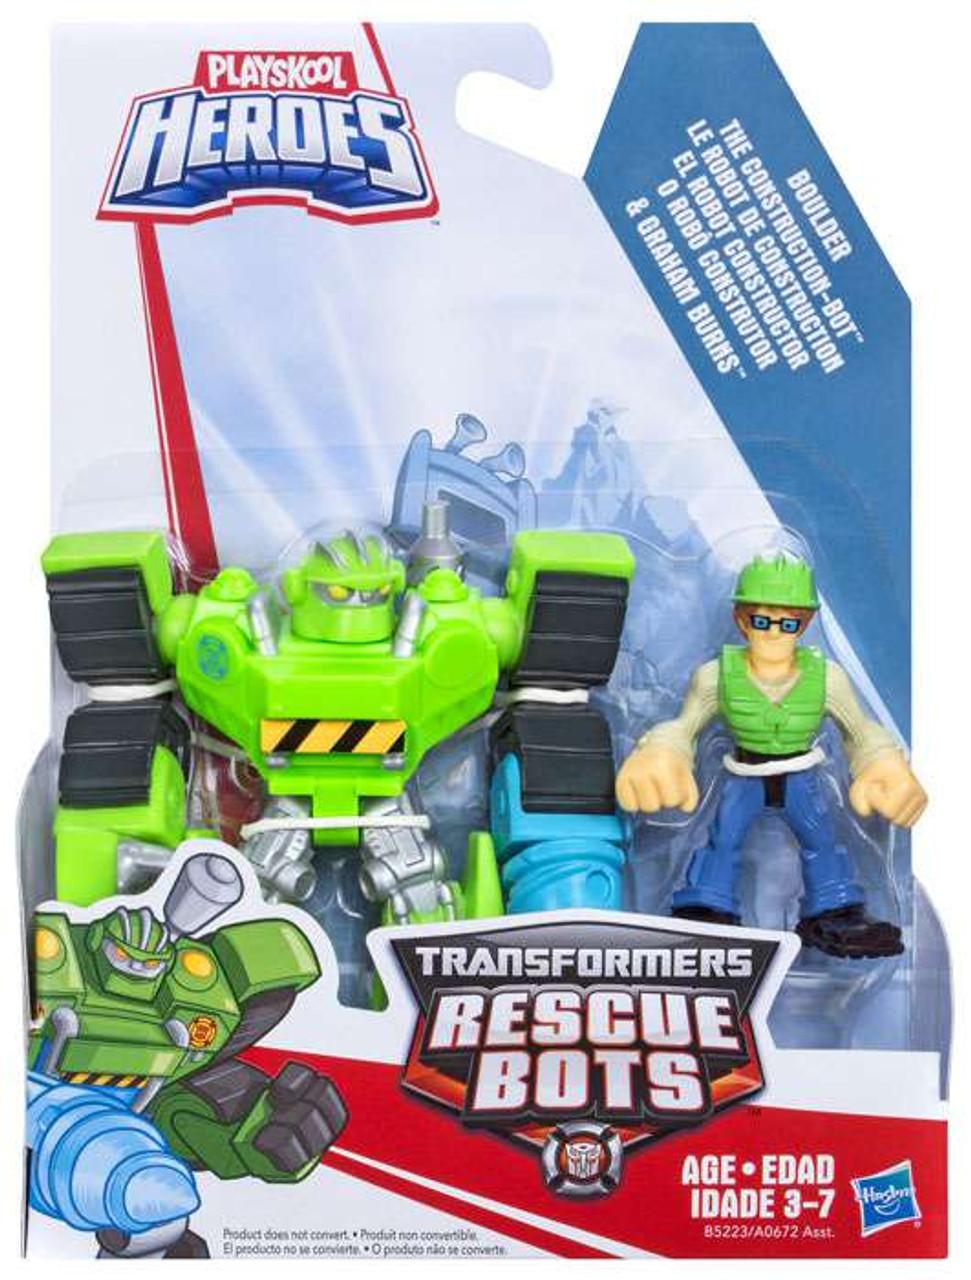 Transformers Rescue Bots Playskool Heroes Boulder the Construction-Bot &  Graham Burns Action Figure 2-Pack